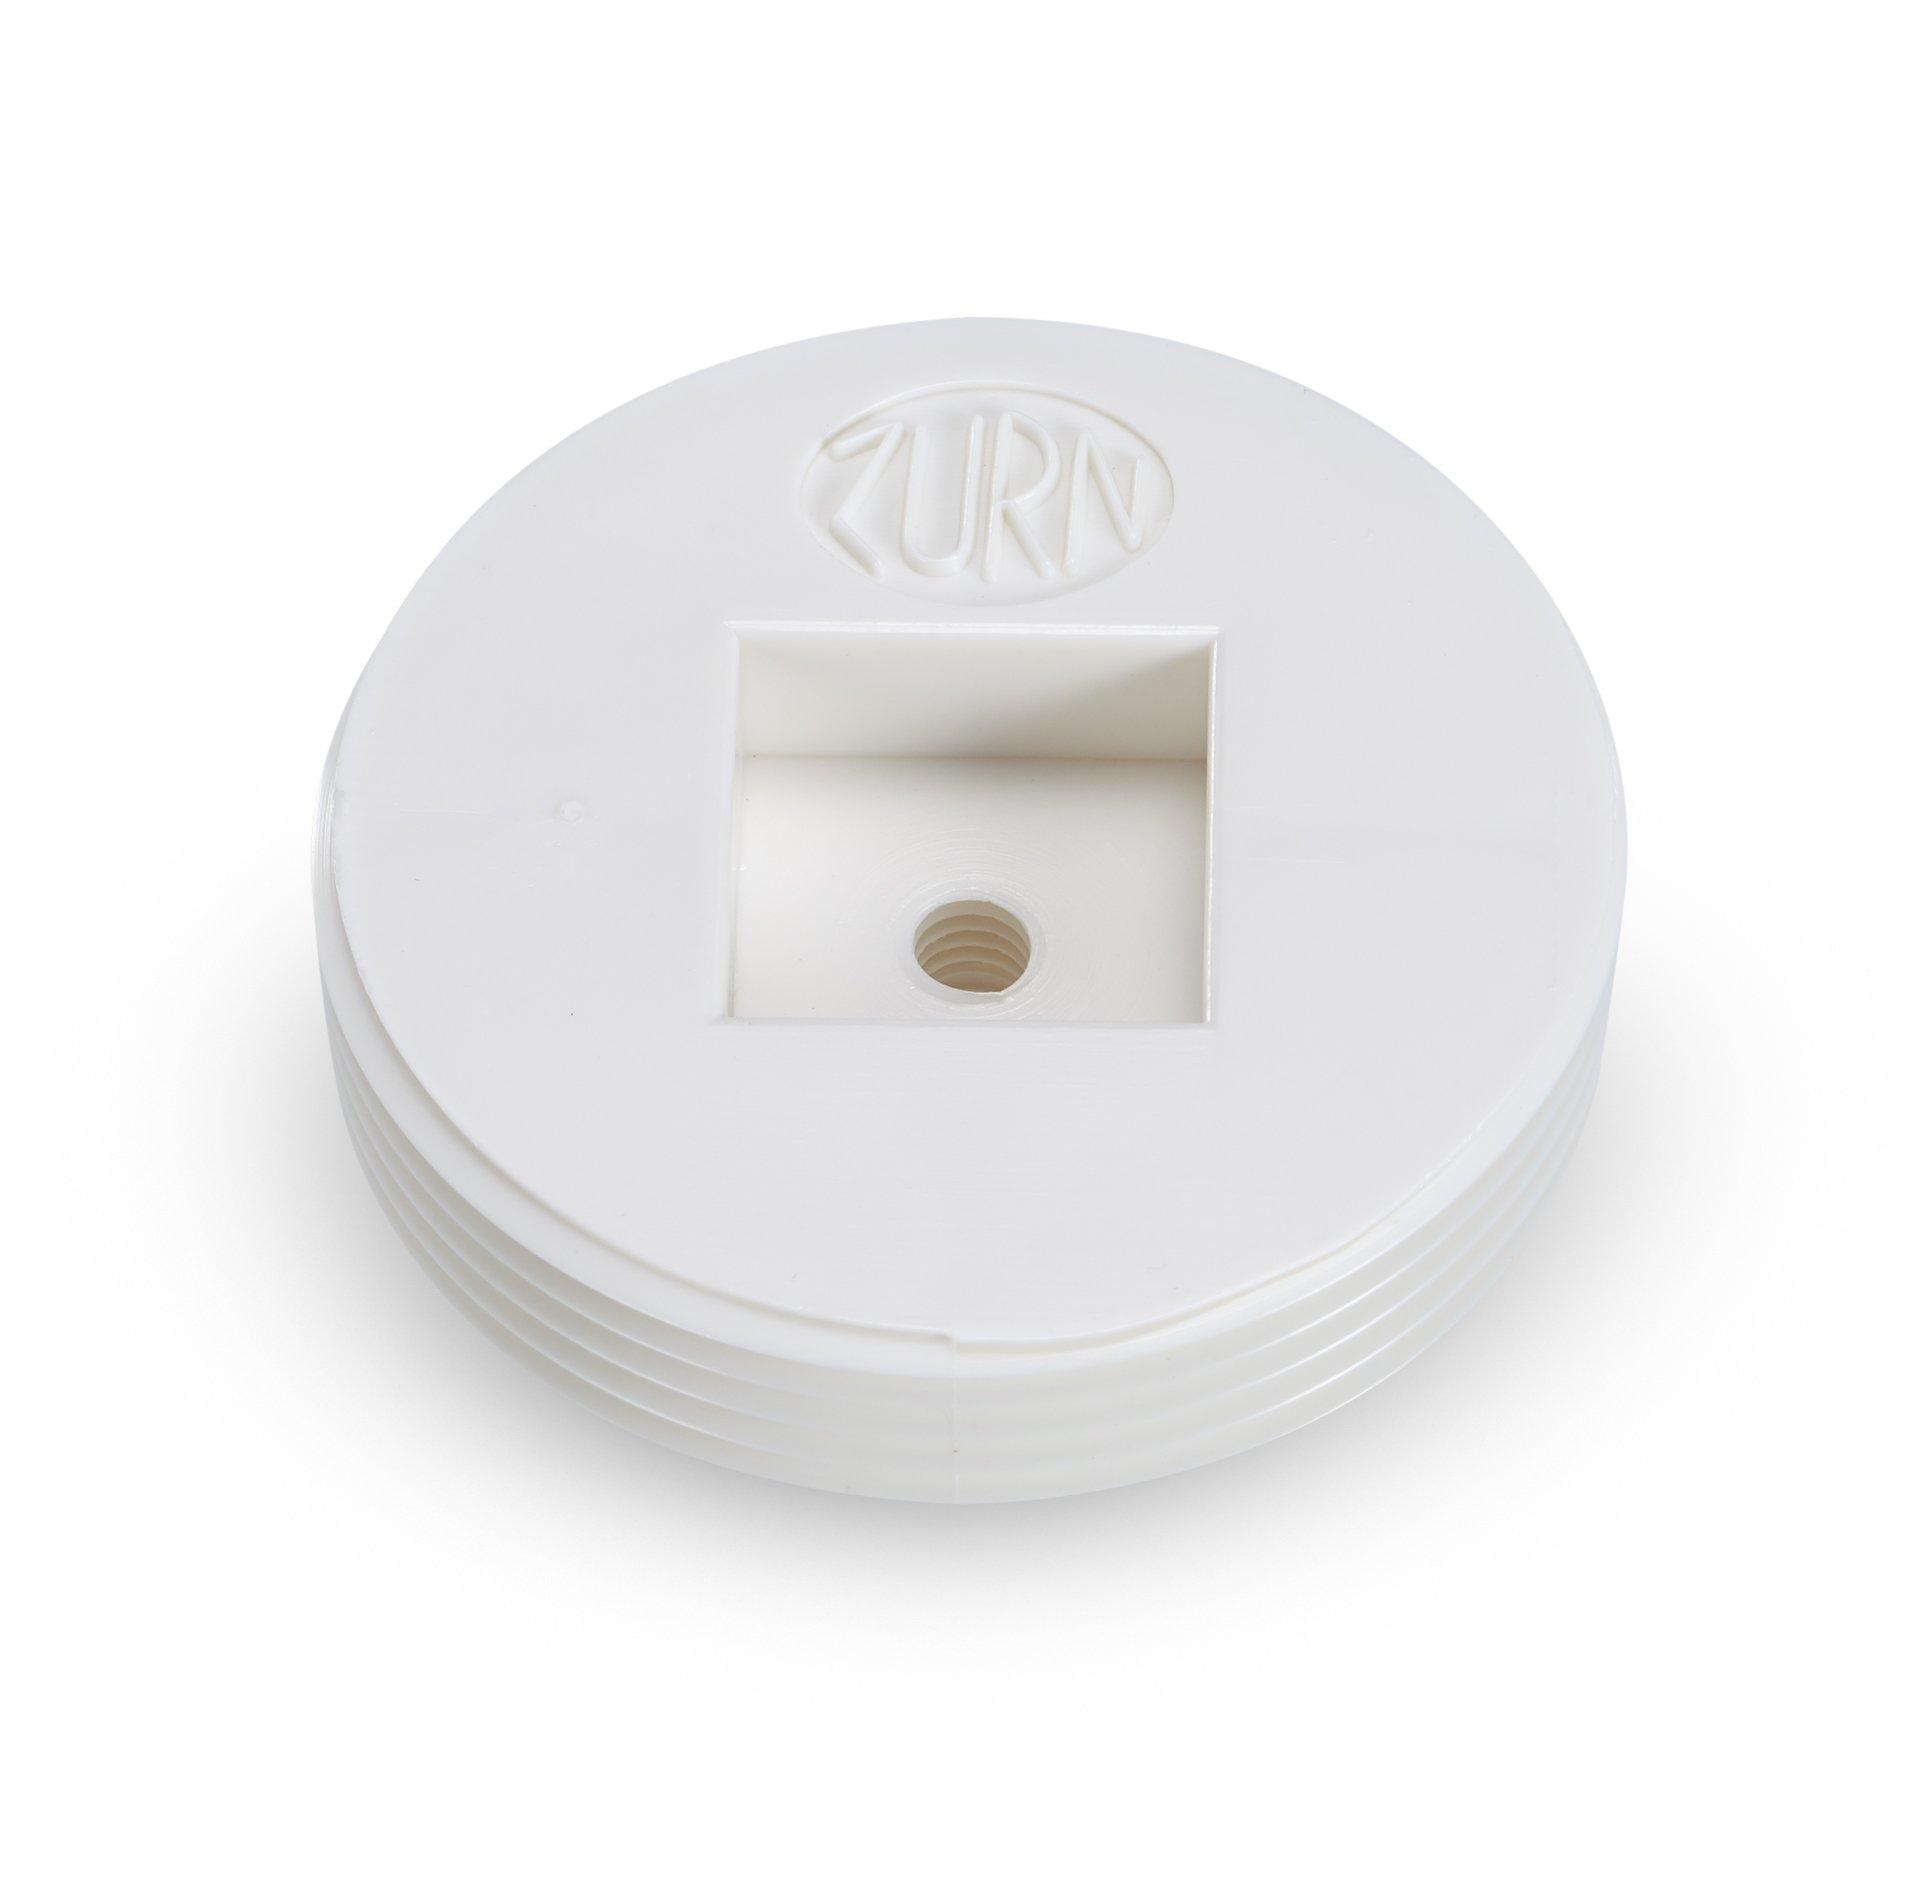 Zurn CO2490-P15 PVC Countersunk Cleanout Plug, 9/16'' Height, 1-1/2'' Diameter, 3.5''